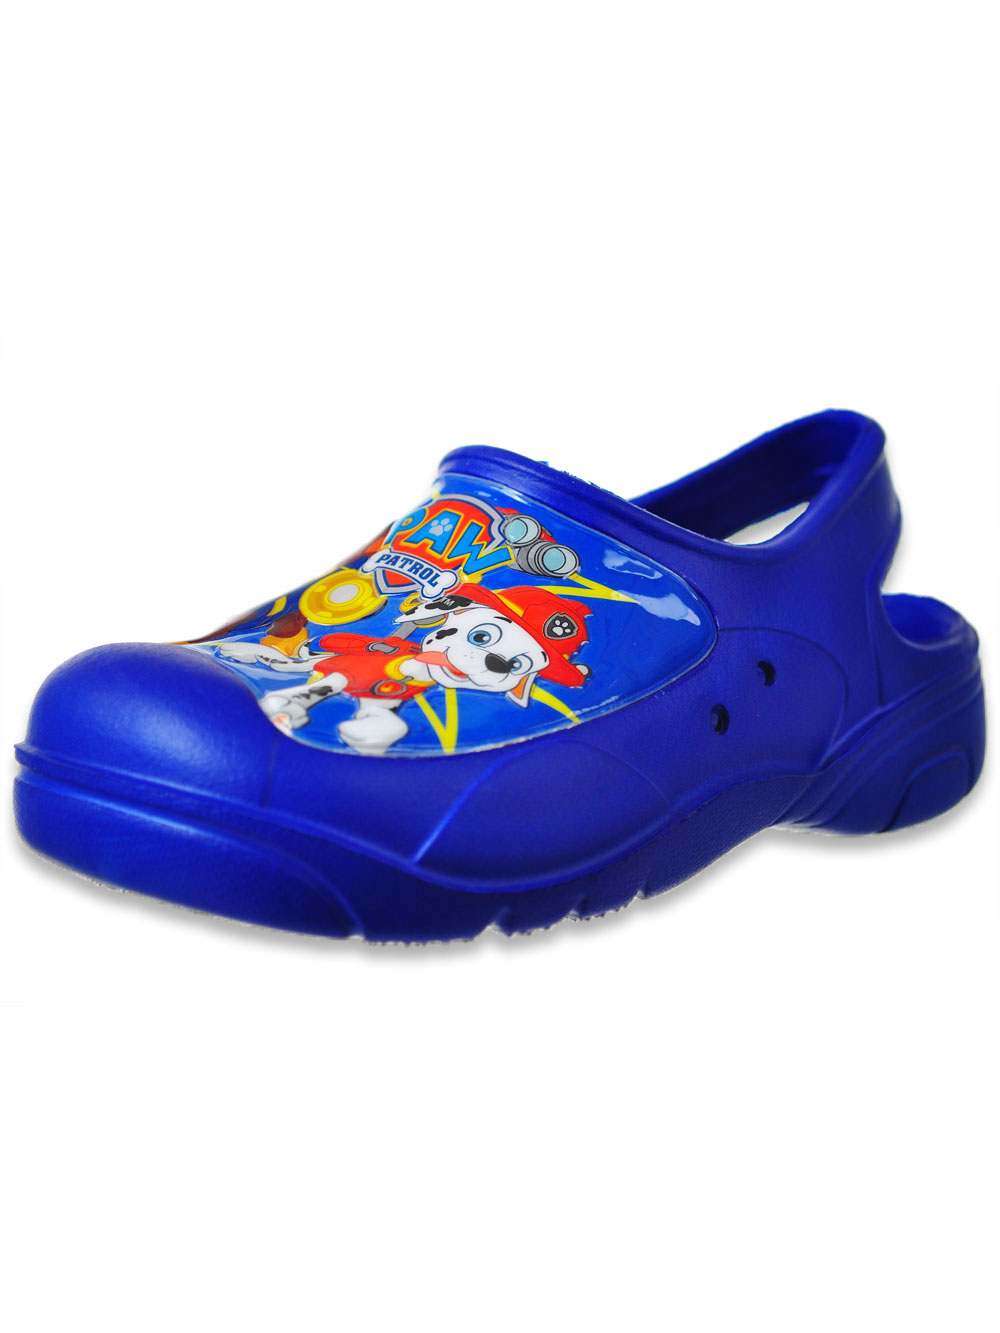 e6ef38ae543a Paw Patrol Boys' Croc Shoes (Sizes 5 – 12)